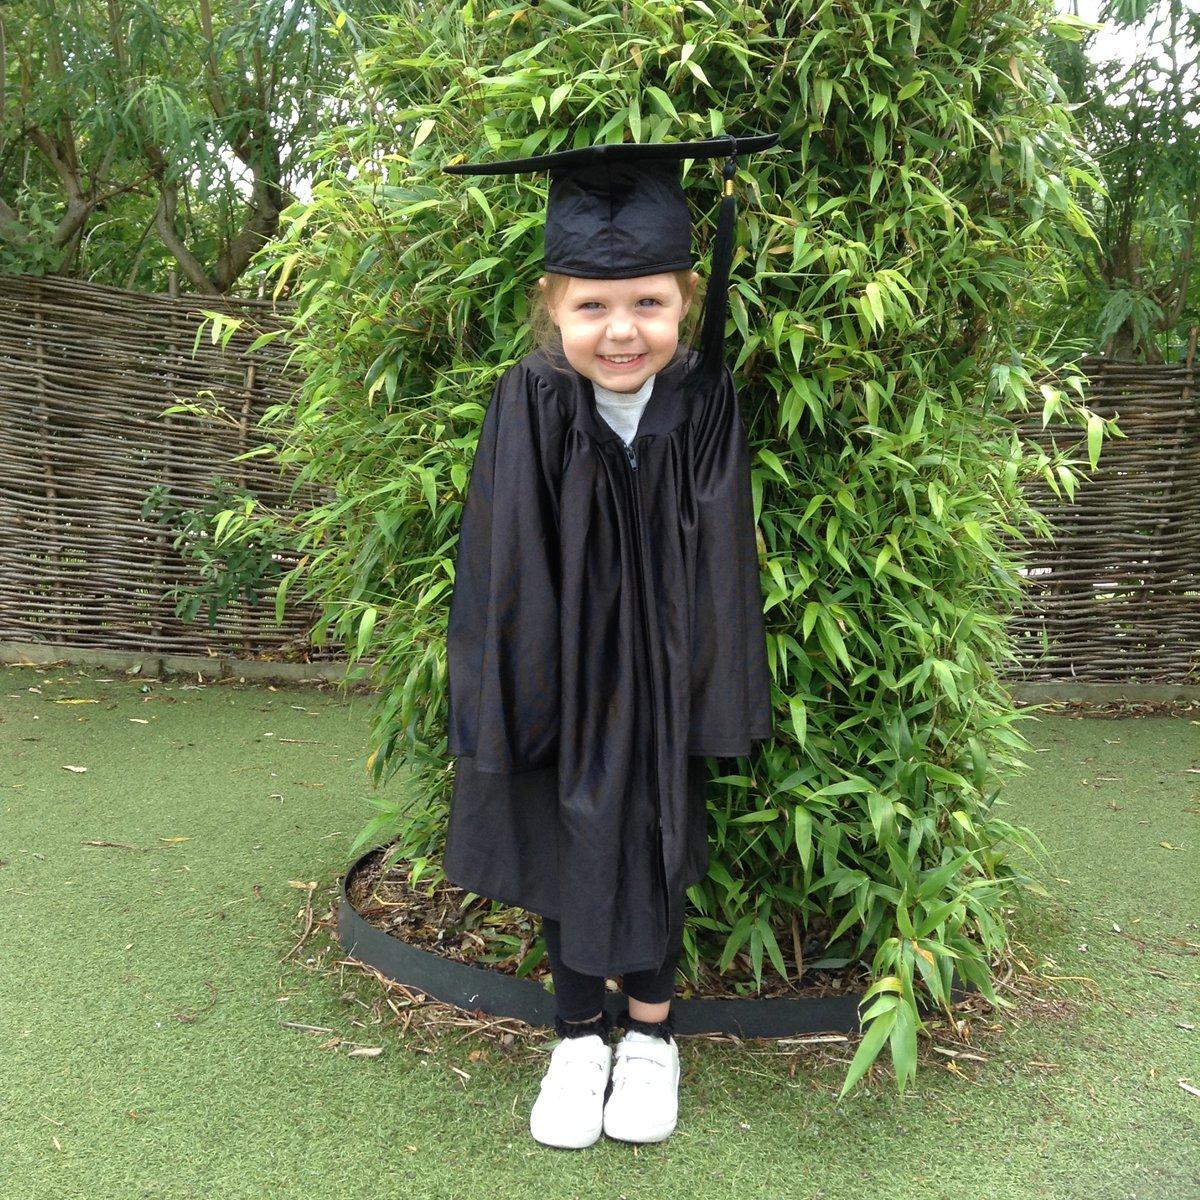 Nursery Graduation, Class of 2020 #newadventures #startingschoolpic.twitter.com/CVrhFySsHq